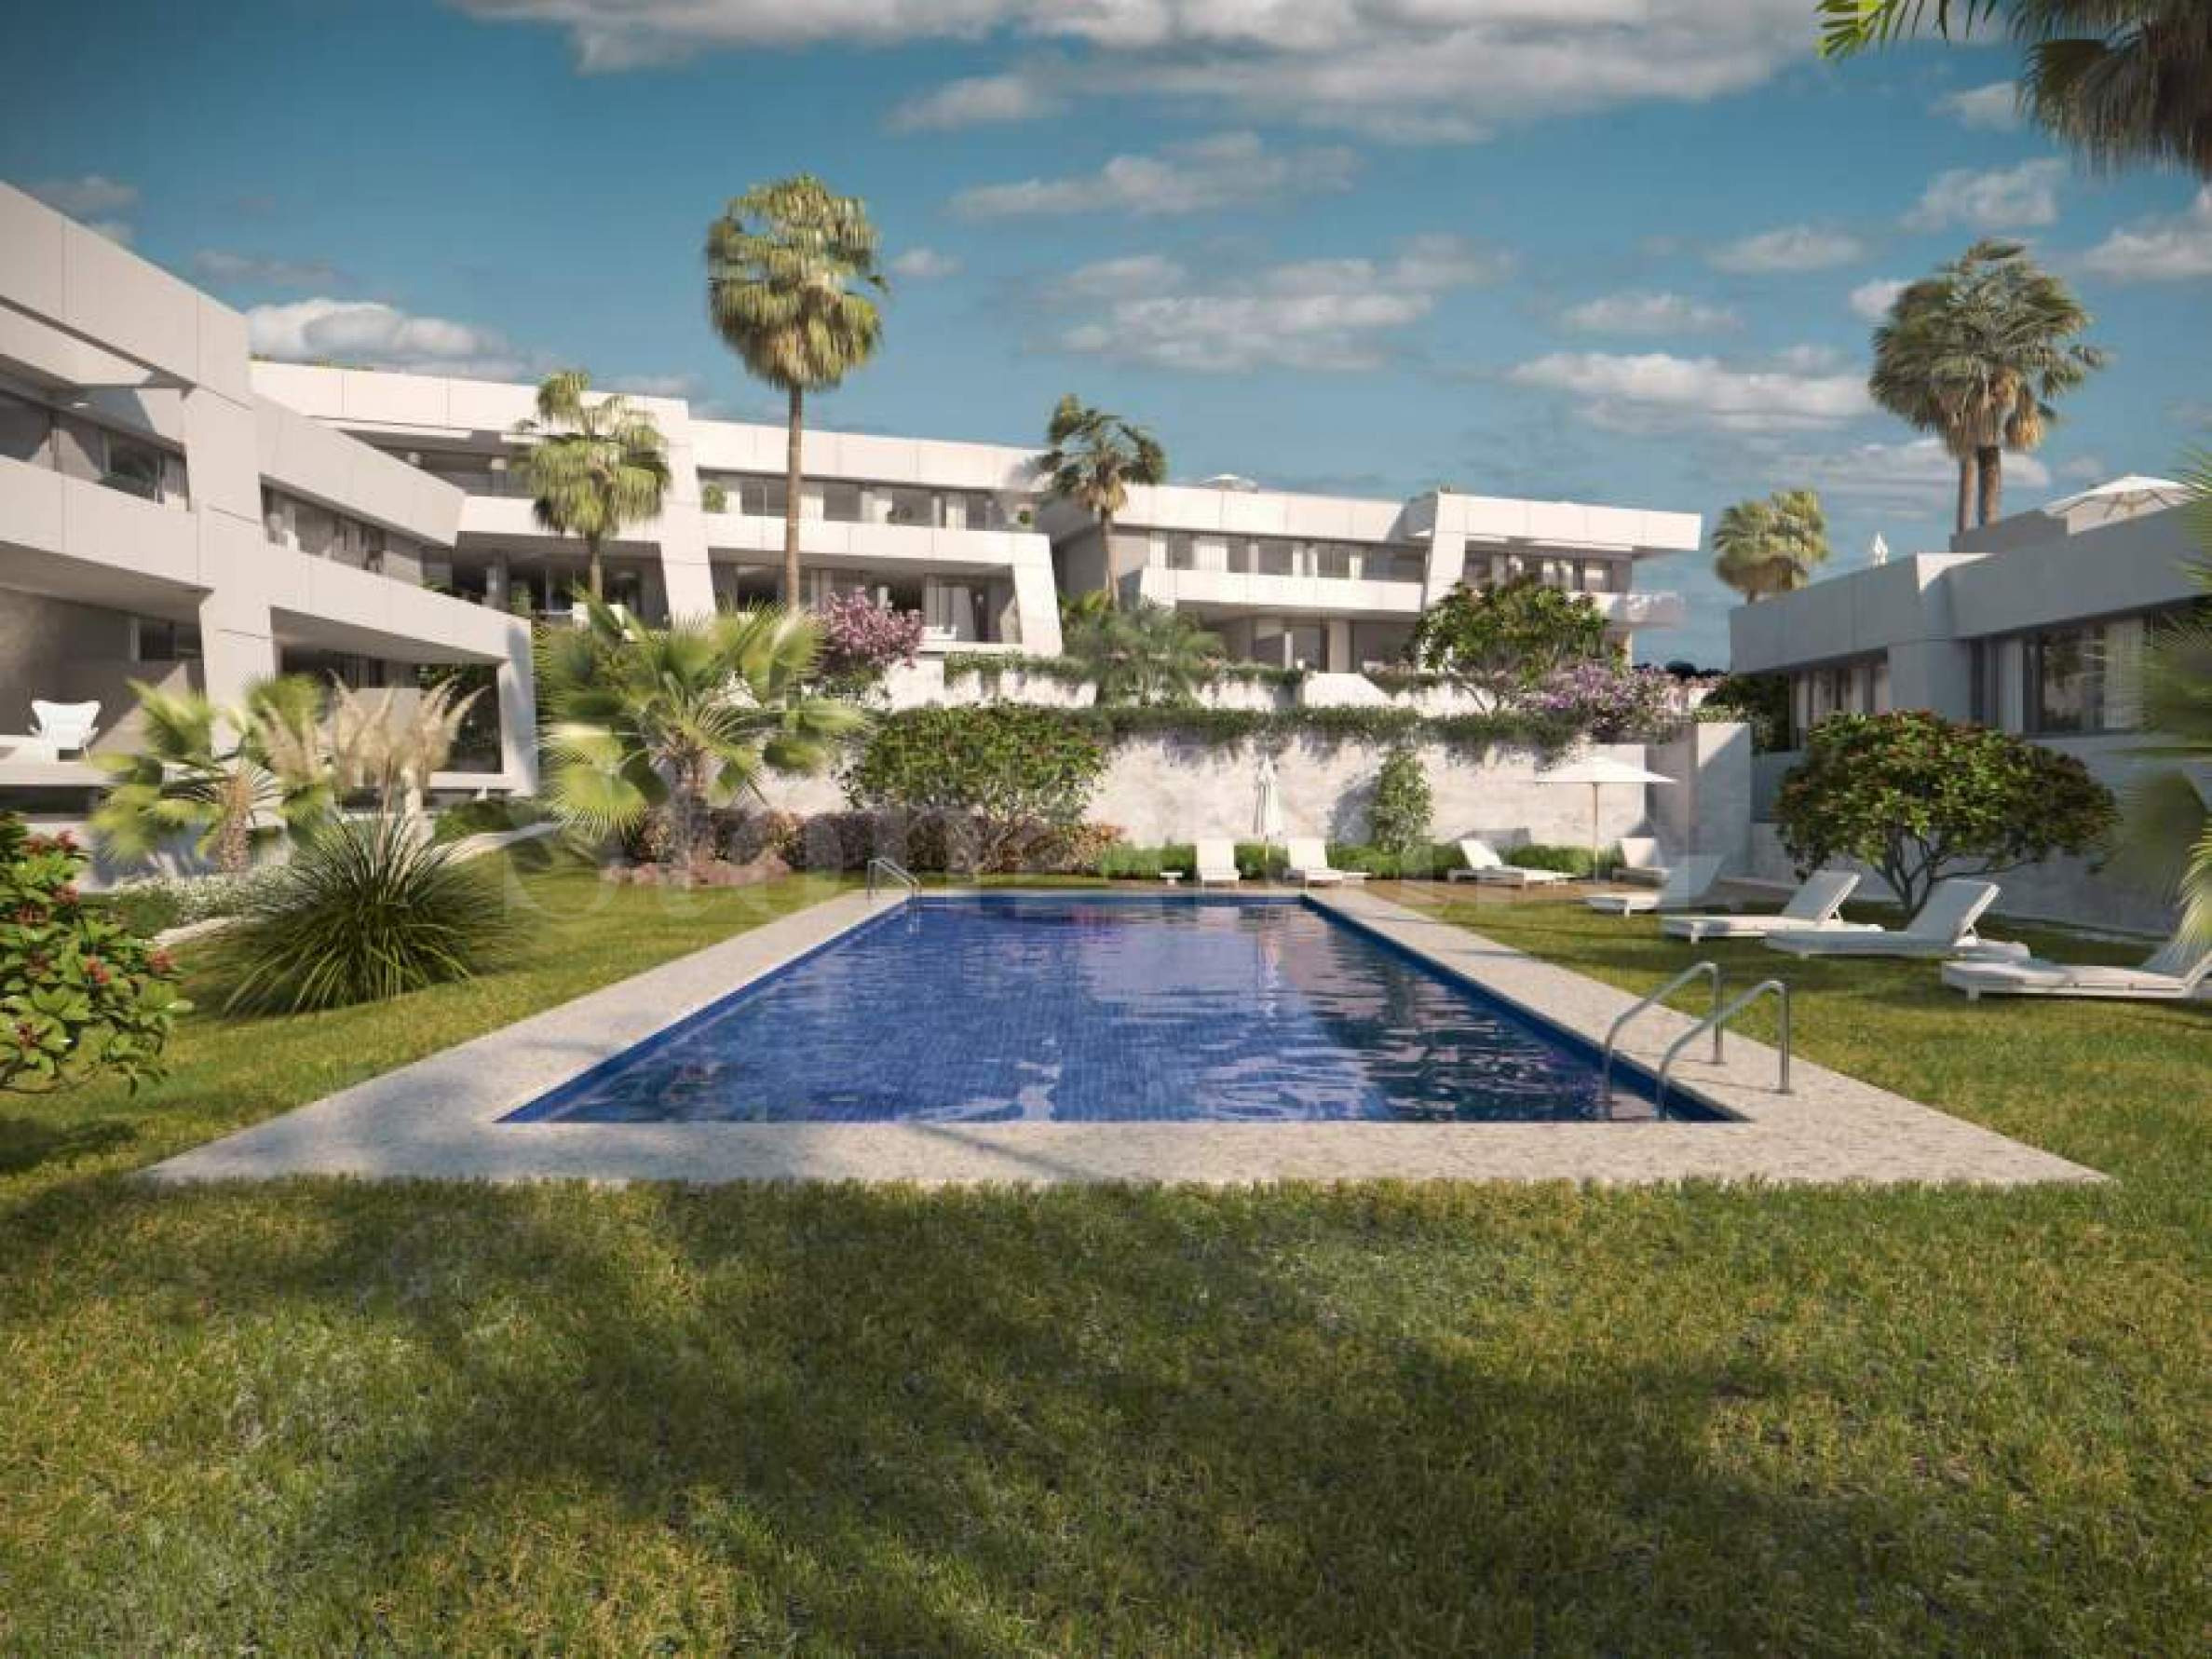 Townhouses with cutting edge design near Marbella2 - Stonehard